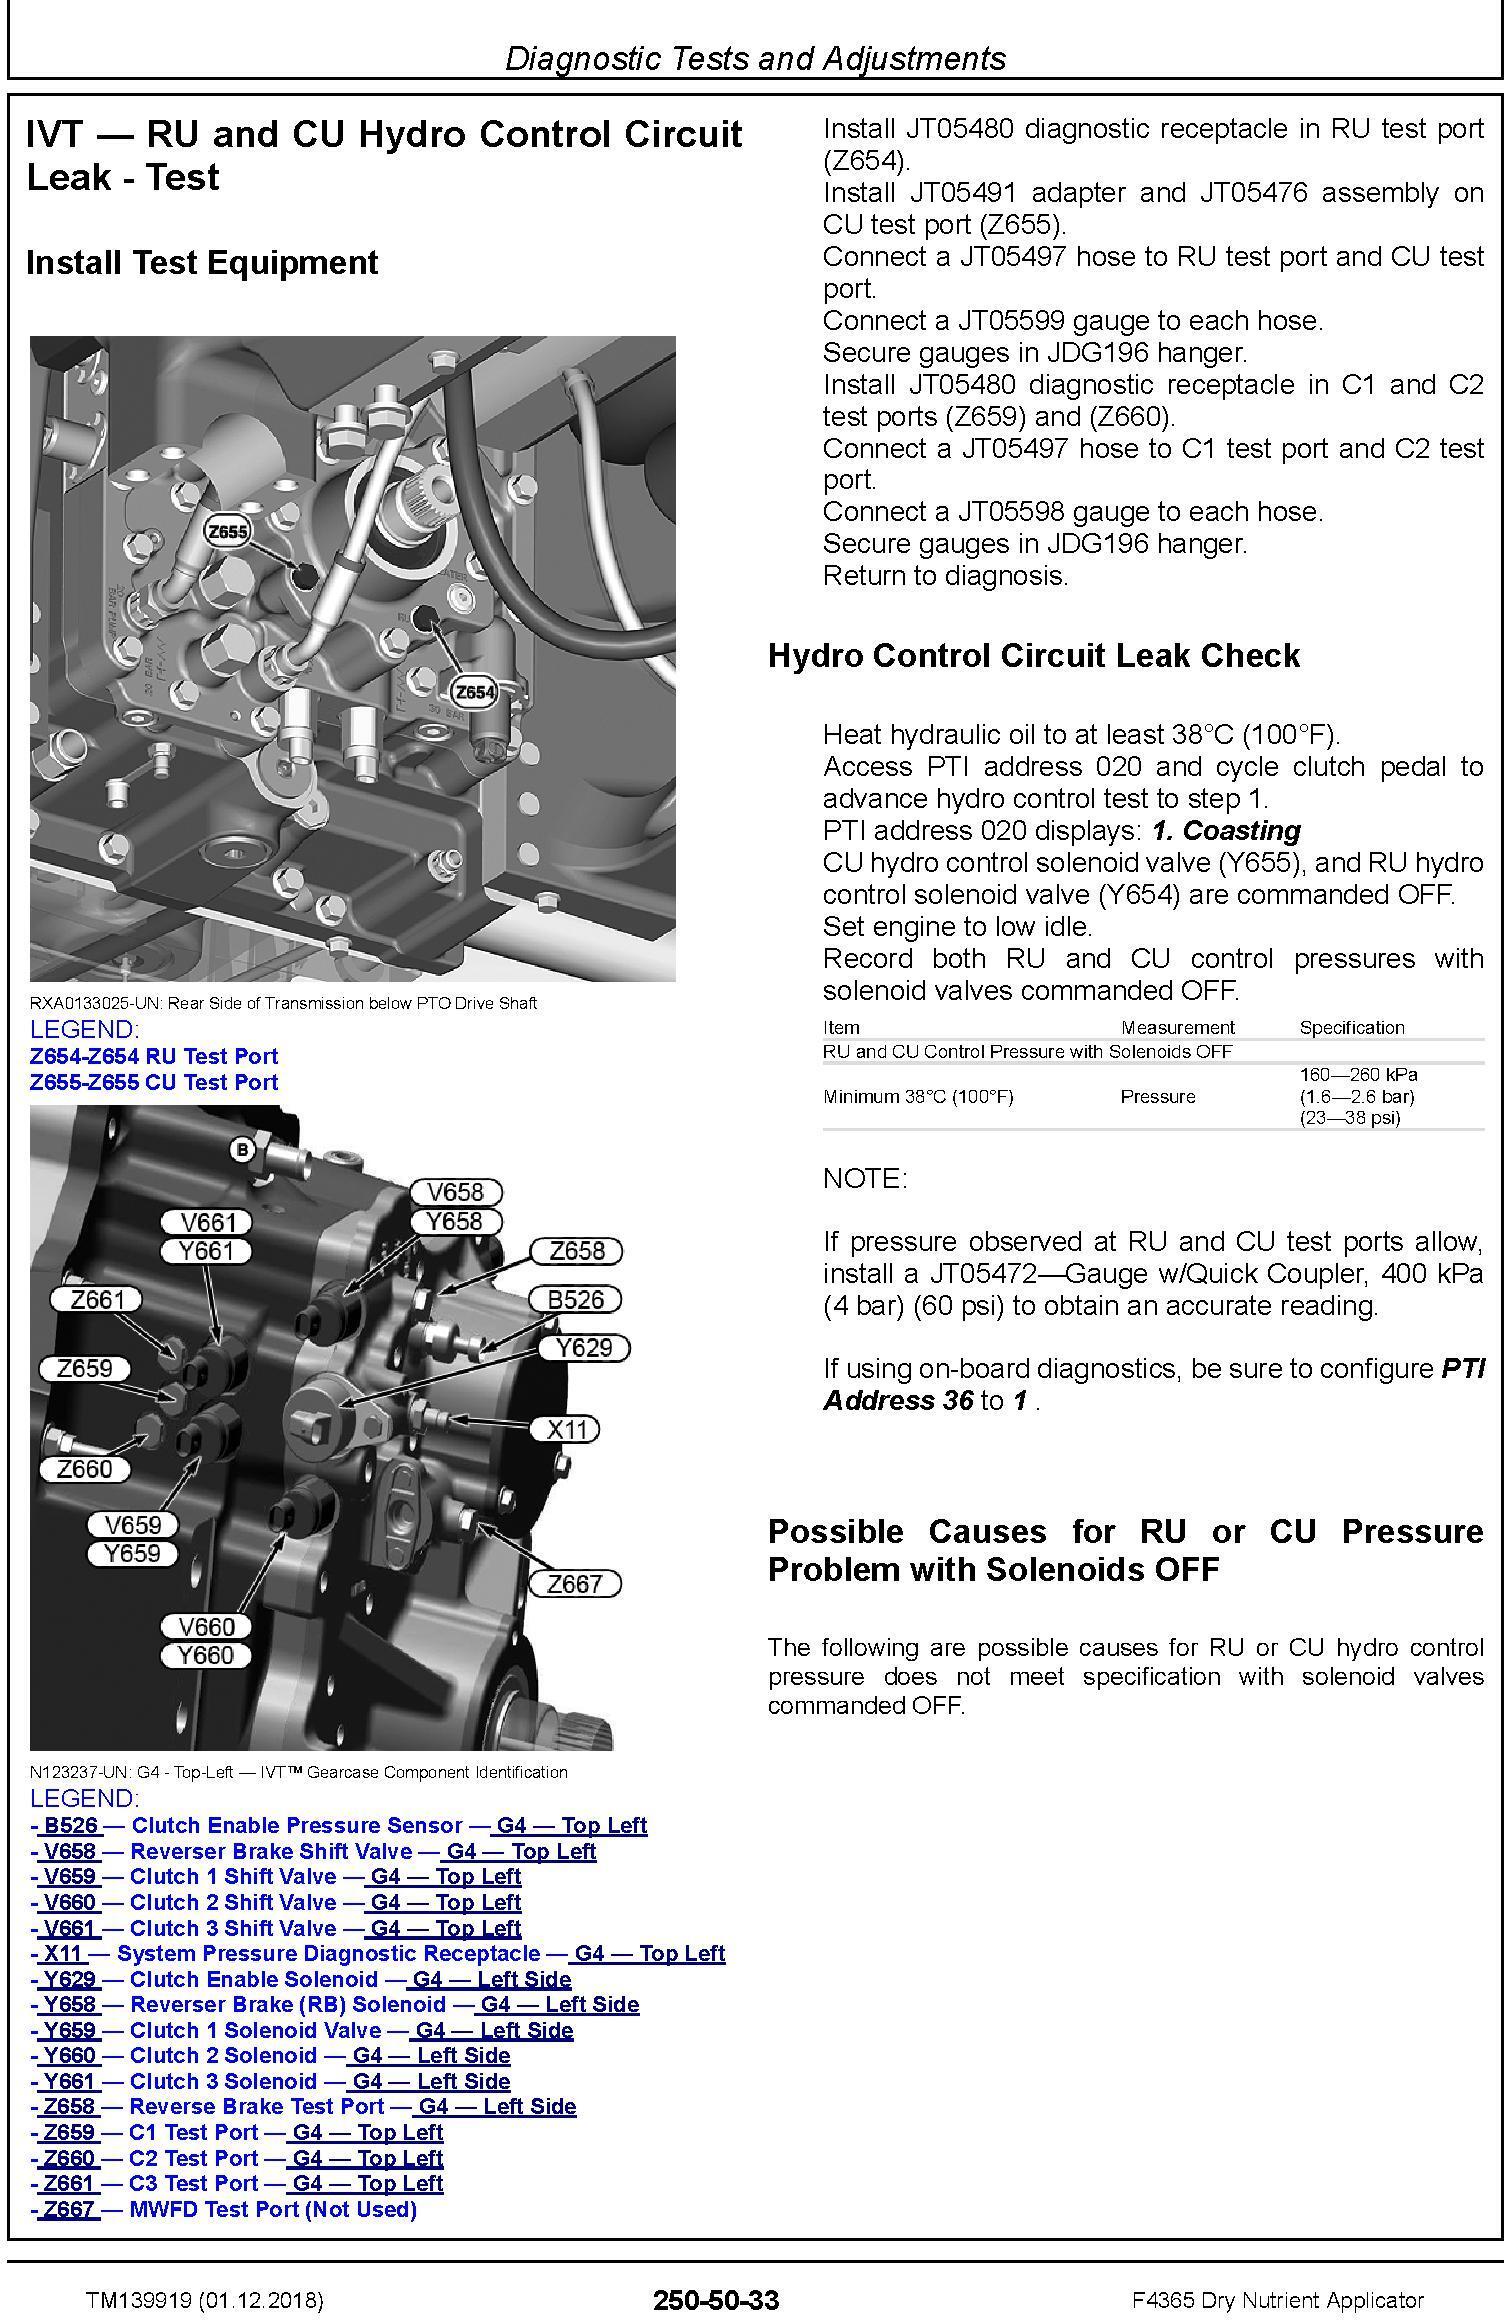 John Deere F4365 Dry Nutrient Applicator Diagnostic Technical Service Manual (TM139919) - 3